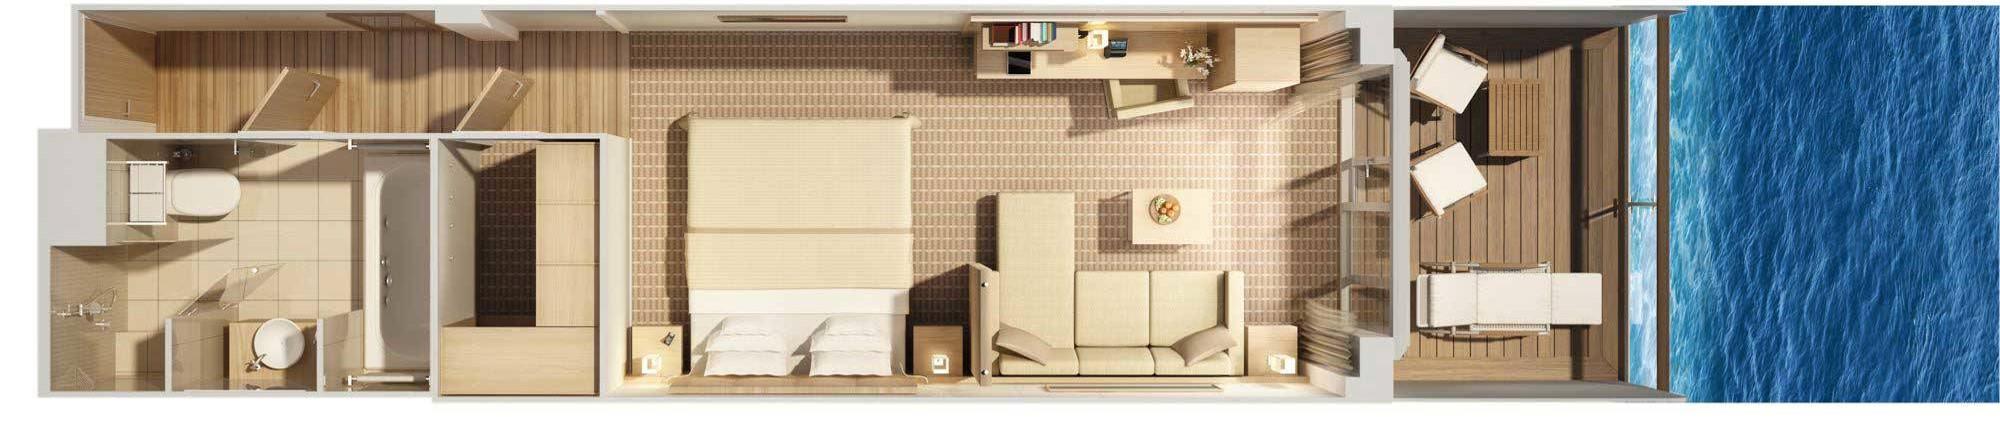 Hapag Lloyd Veranda Suite MS Europa 2